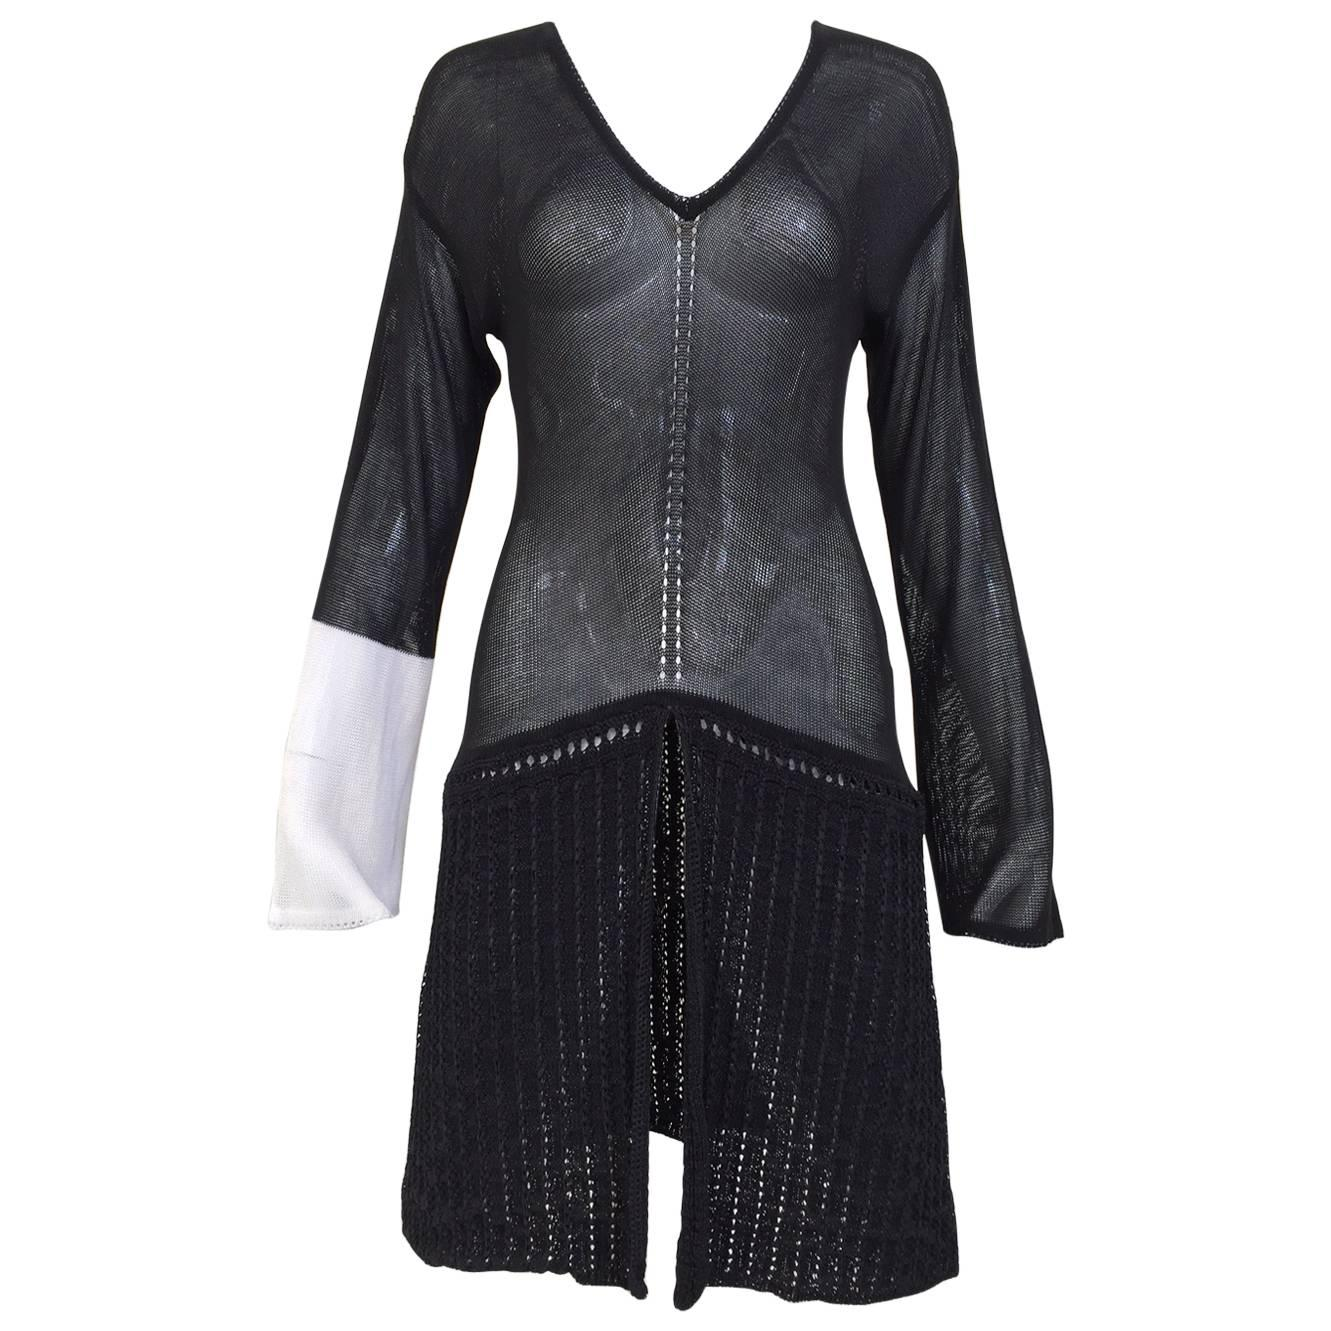 Gianfranco Ferre black knit tunic top, 1980s